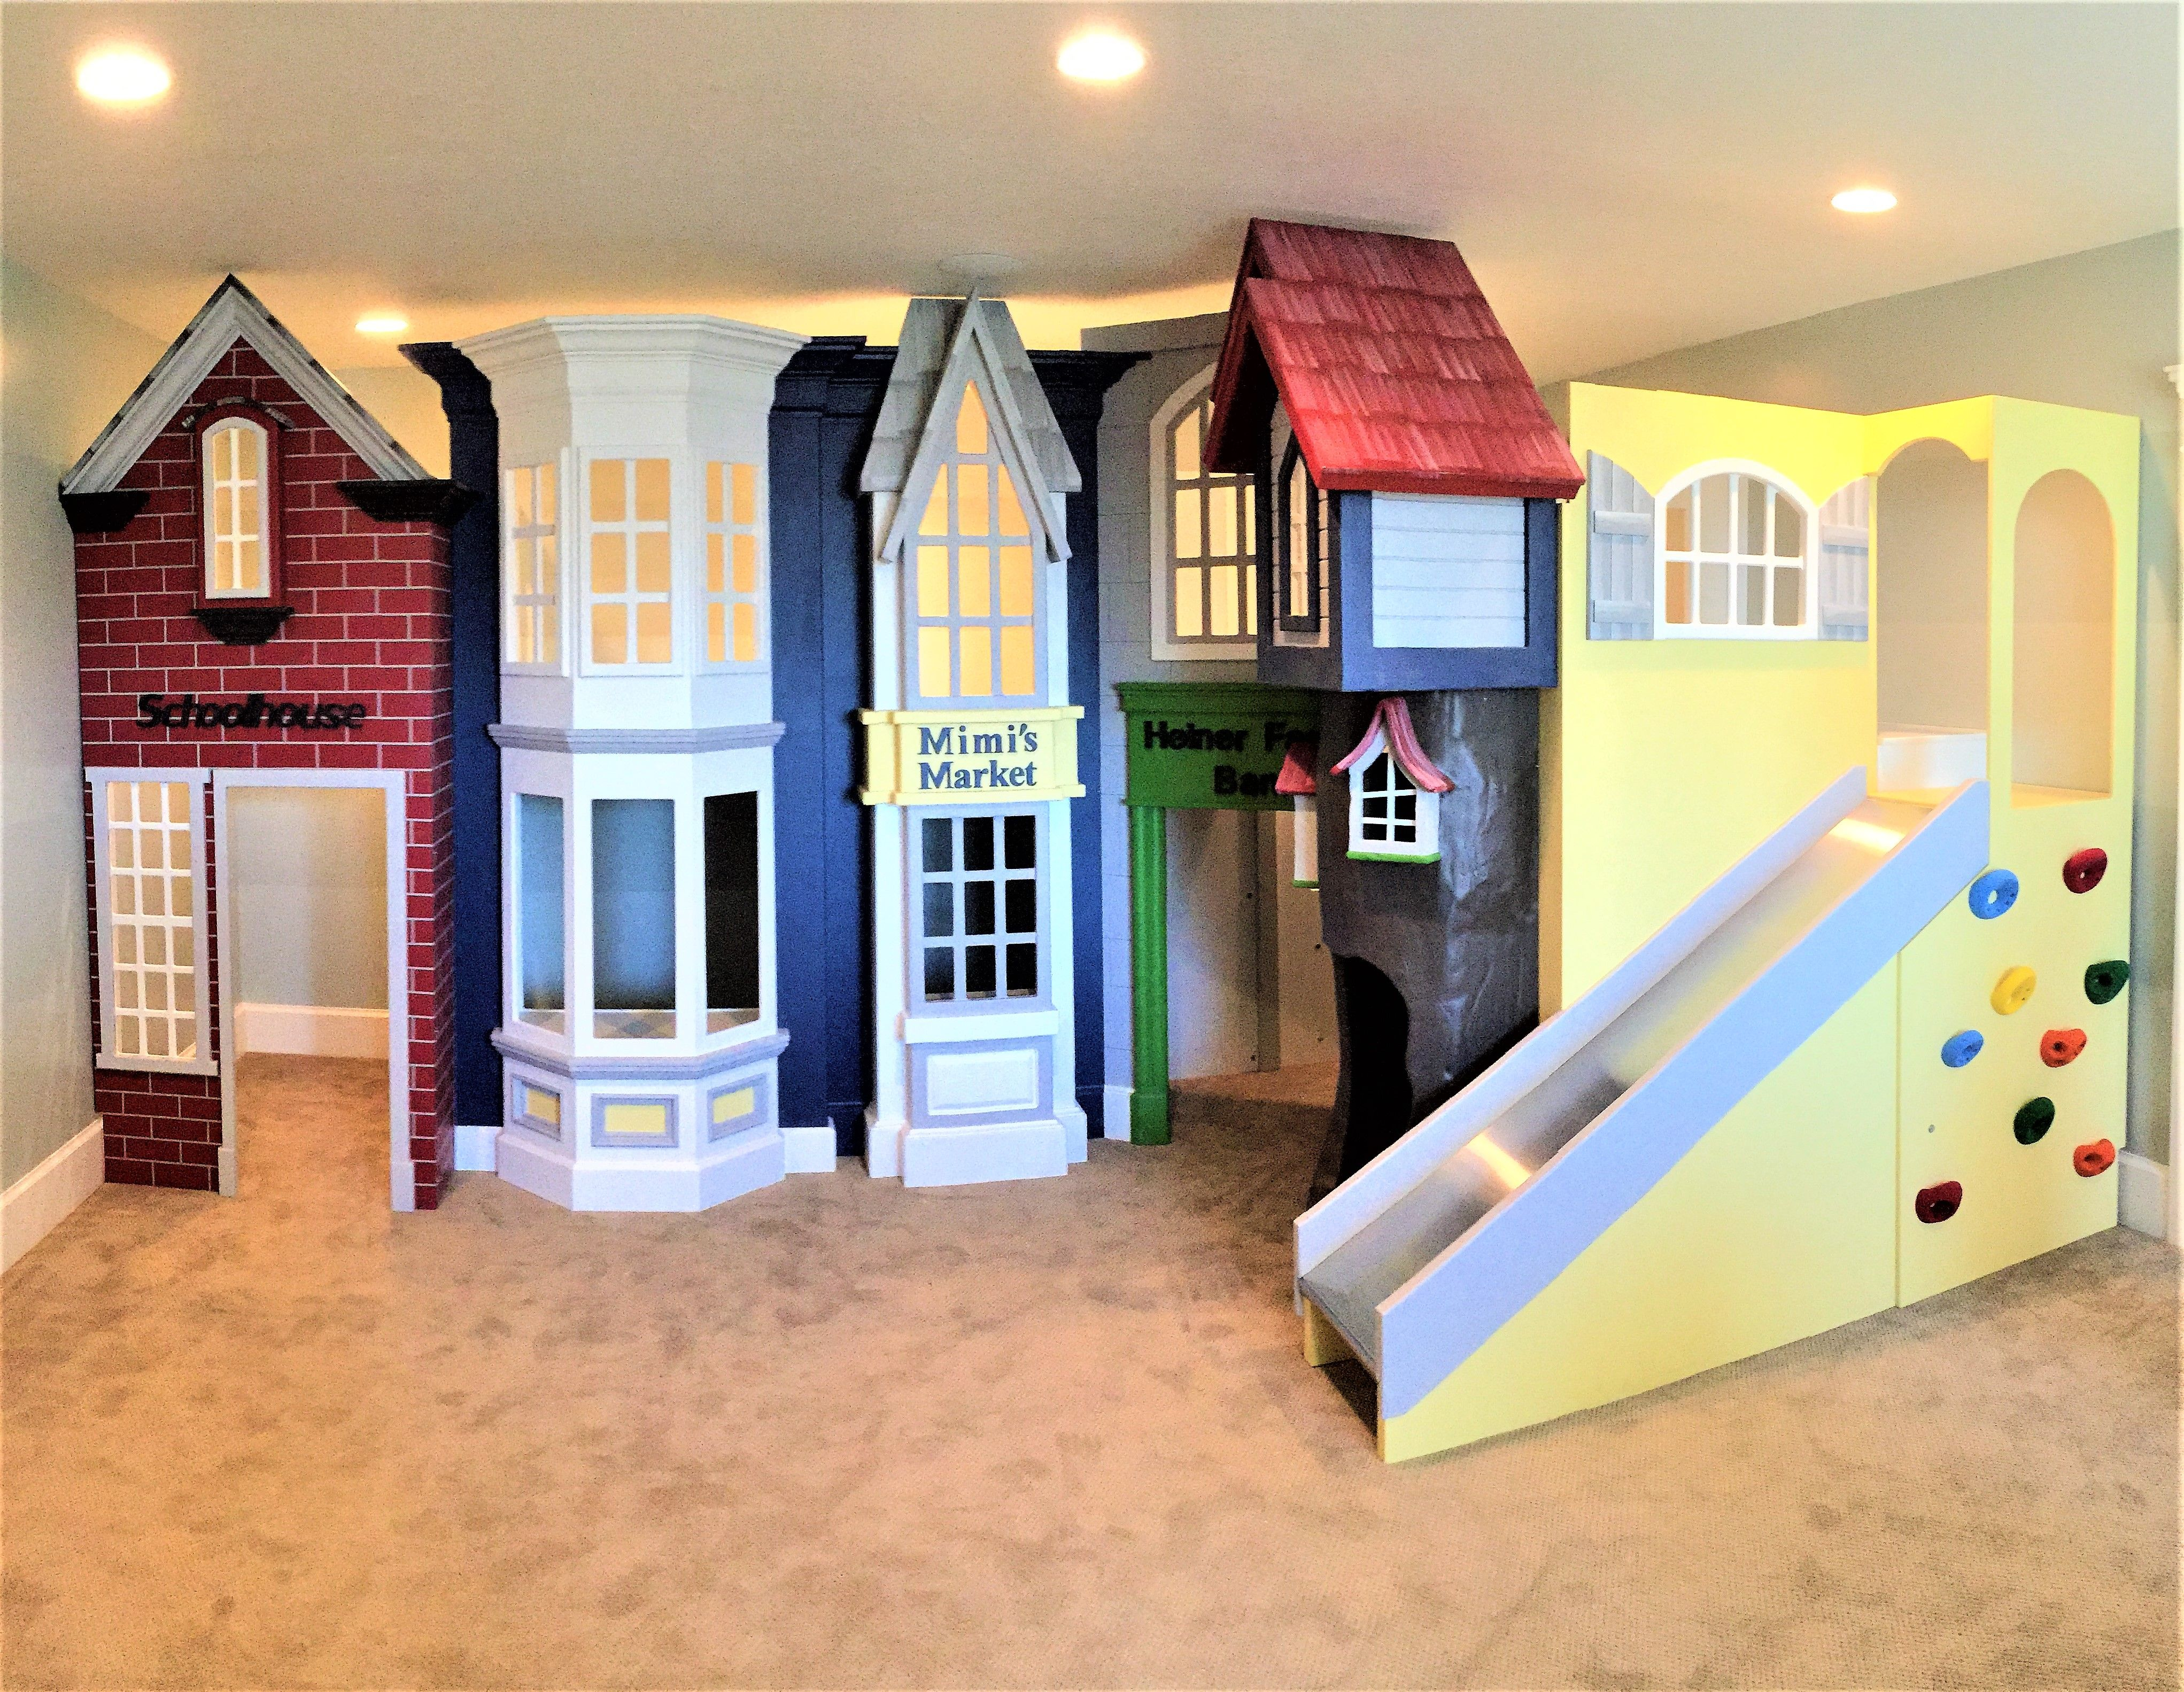 classic storefront playhouse new designs play houses kids rh pinterest com